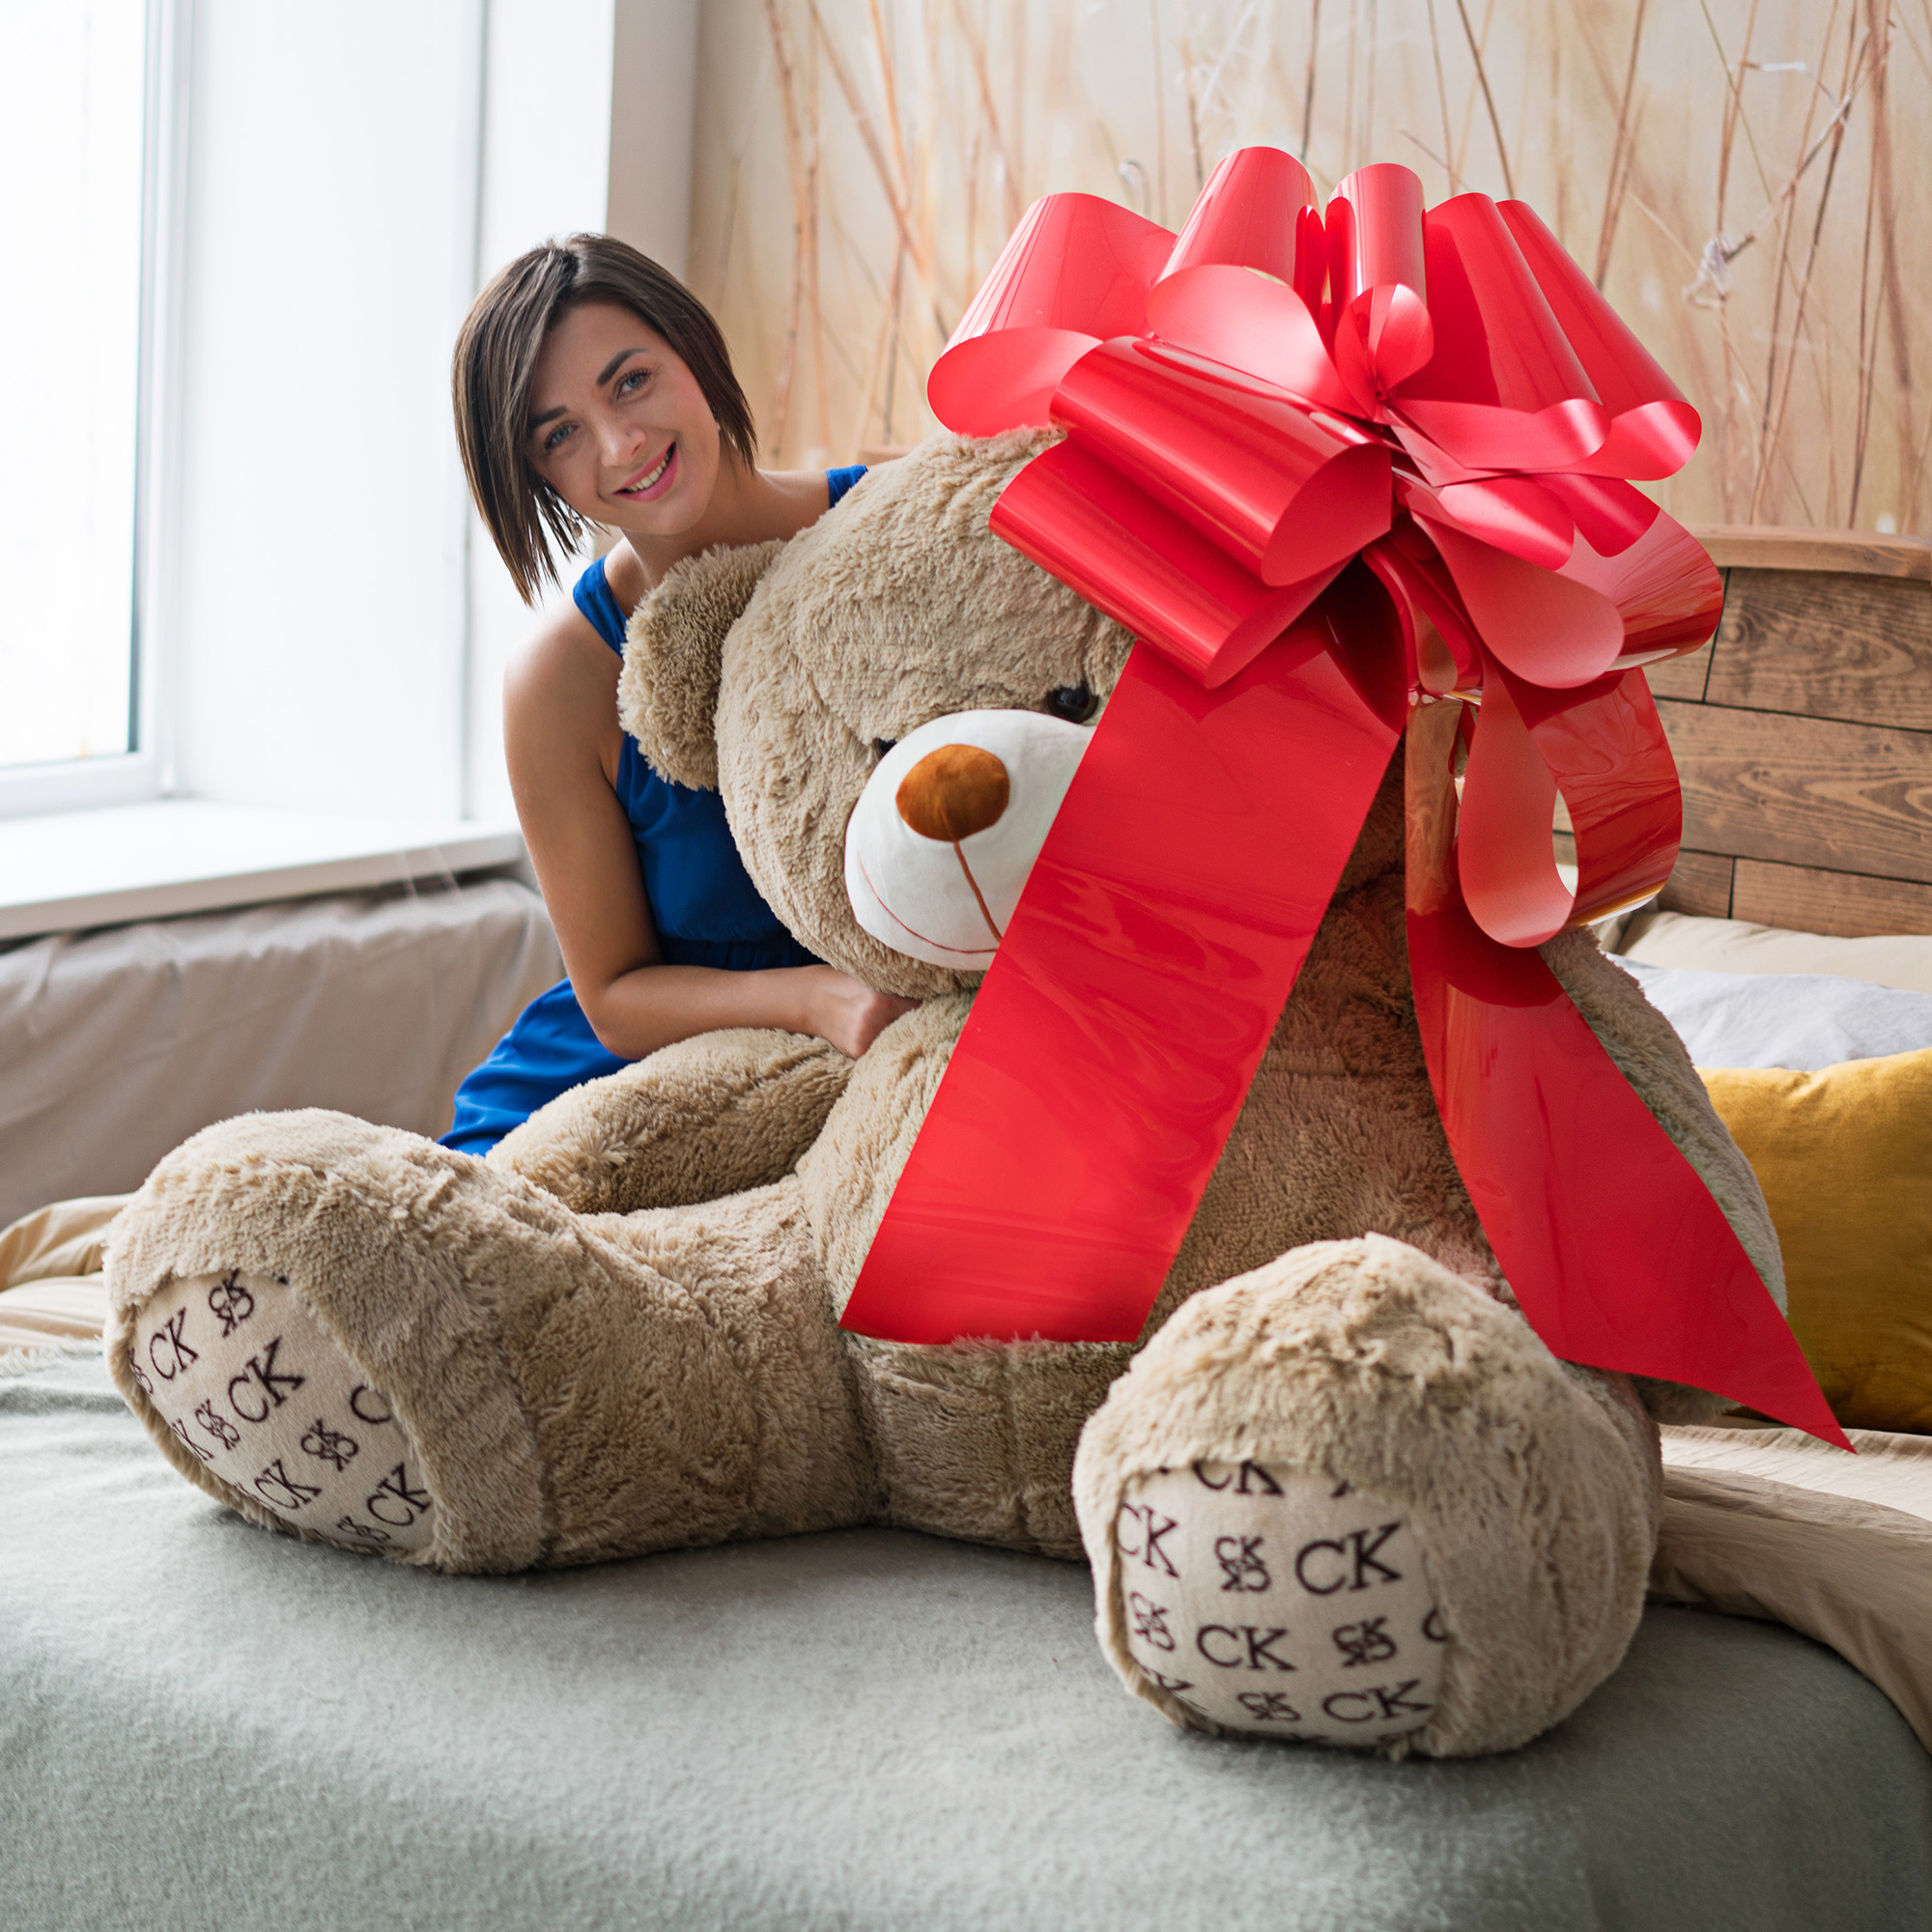 kenley riesige gro e rote schleife 42 cm f r auto fahrrad. Black Bedroom Furniture Sets. Home Design Ideas